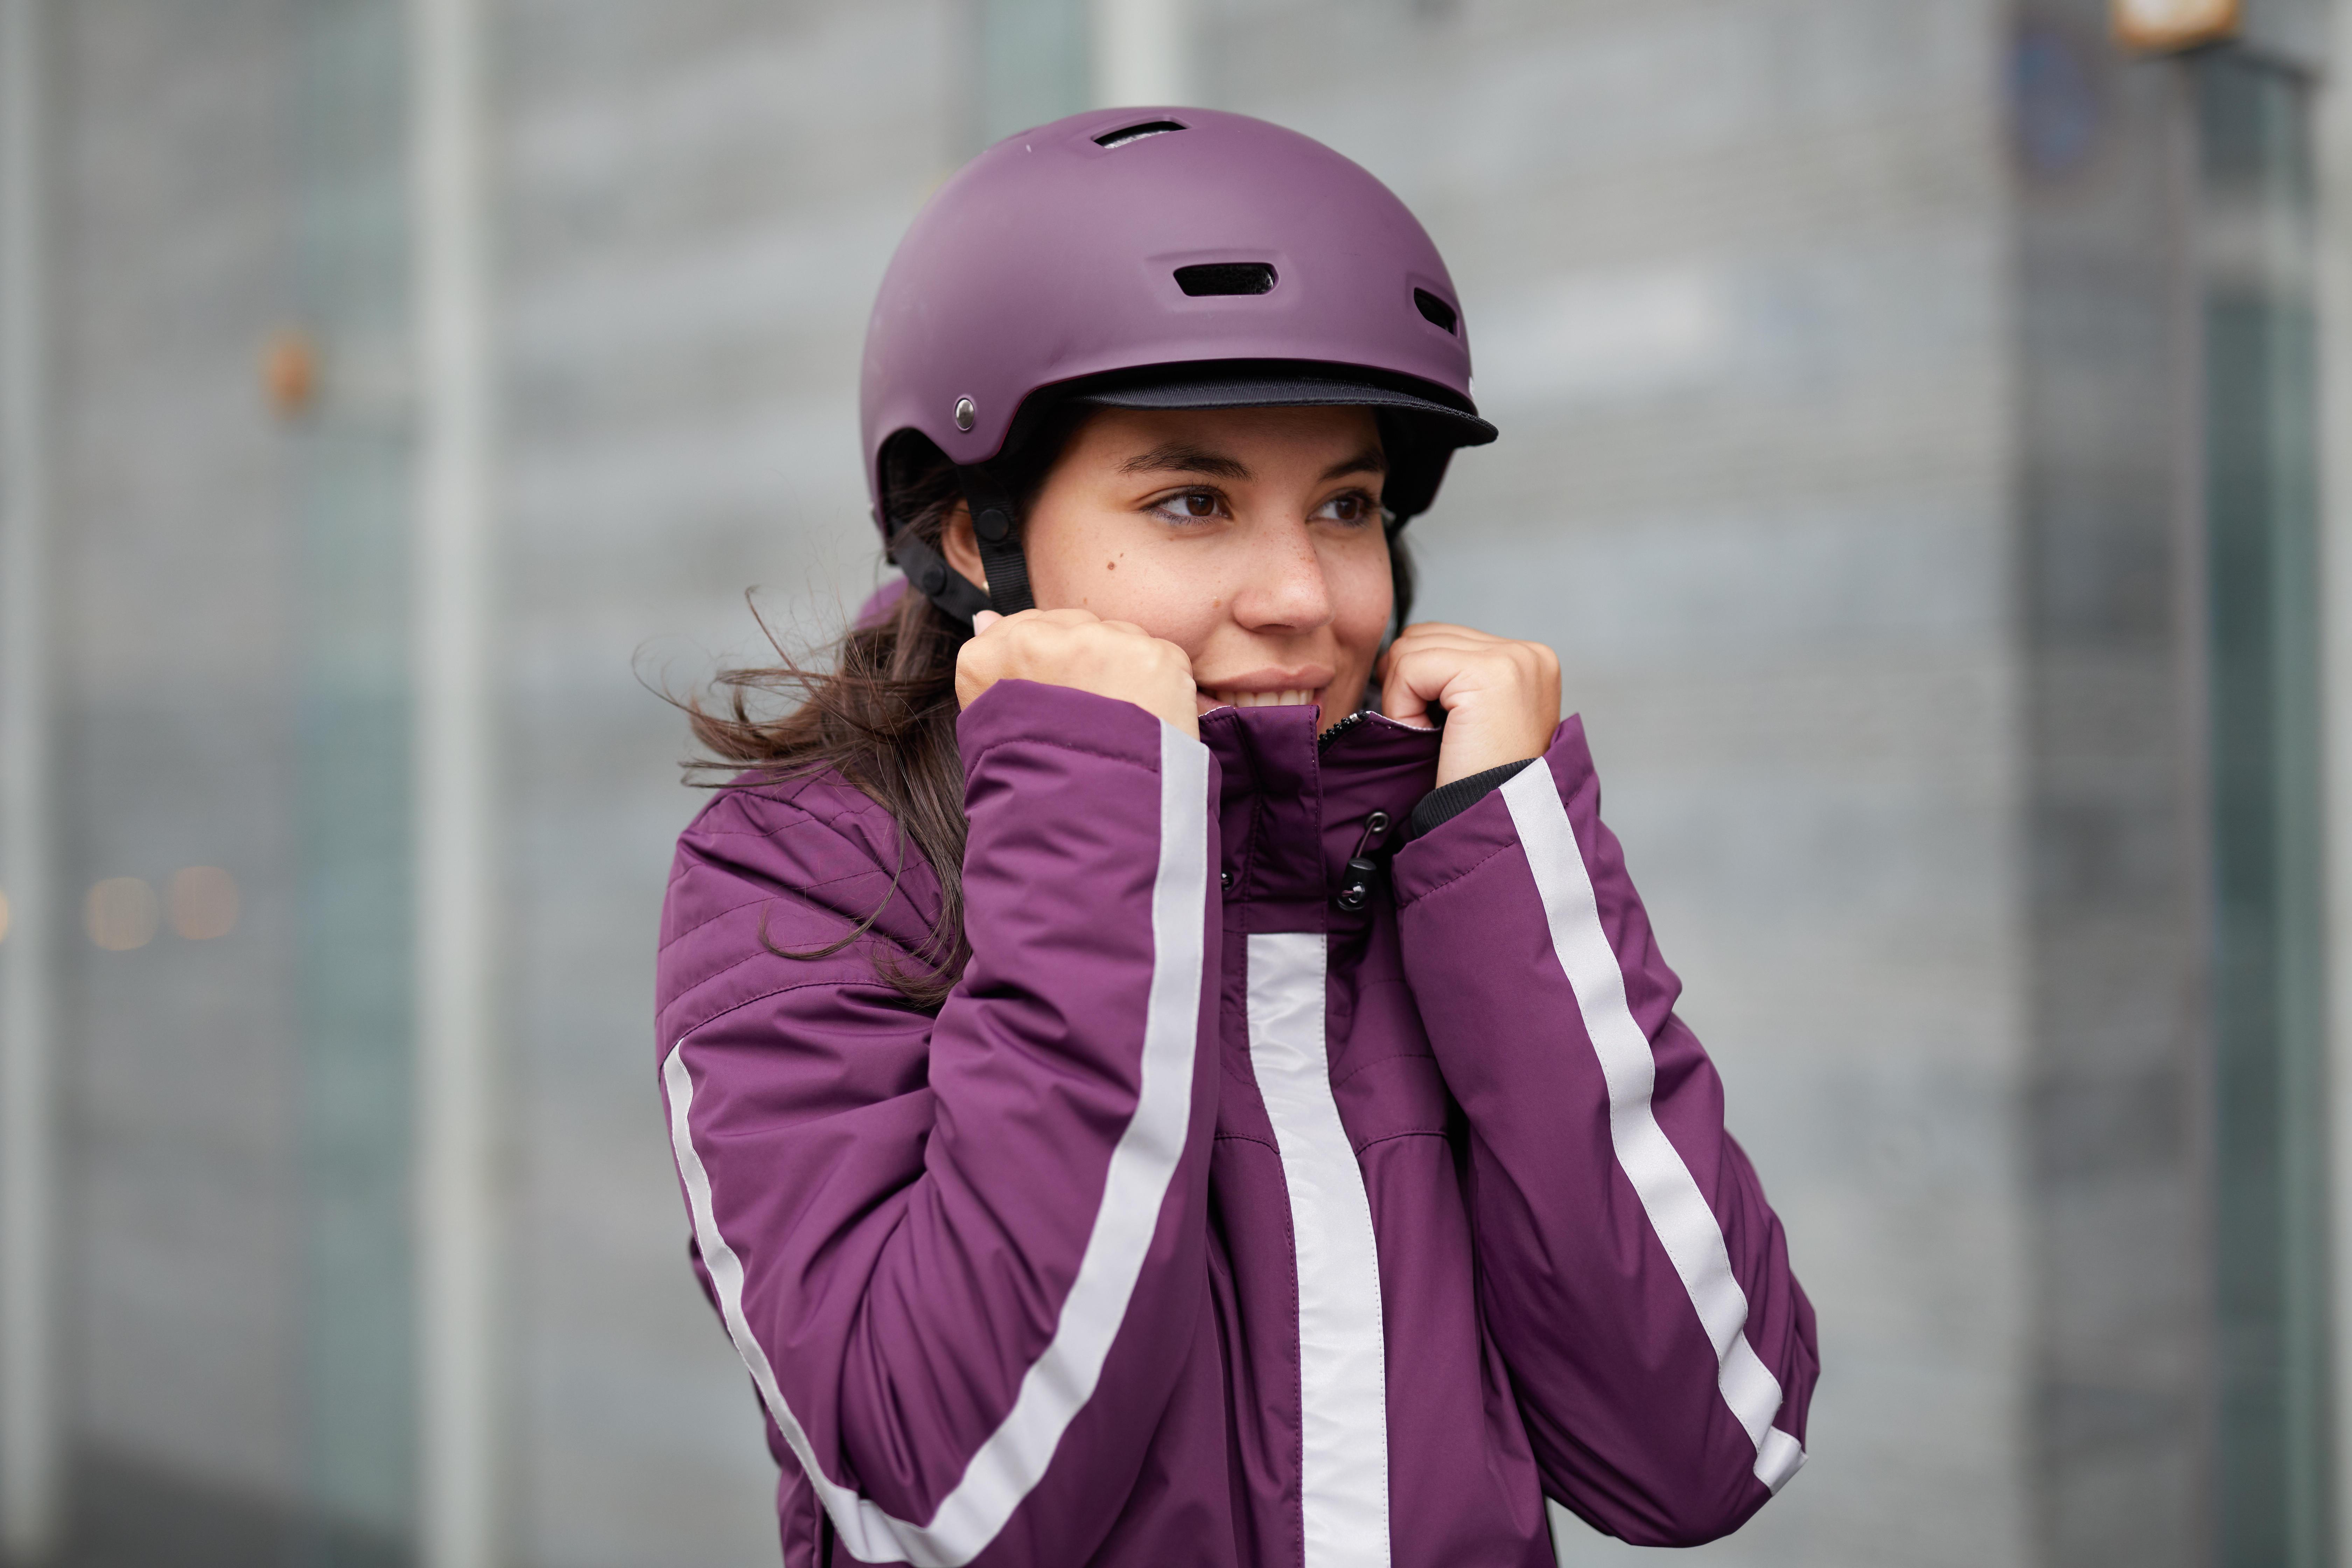 Veste Femme 900 Chaude Prune Vélo Pluie LMqUGSpzV